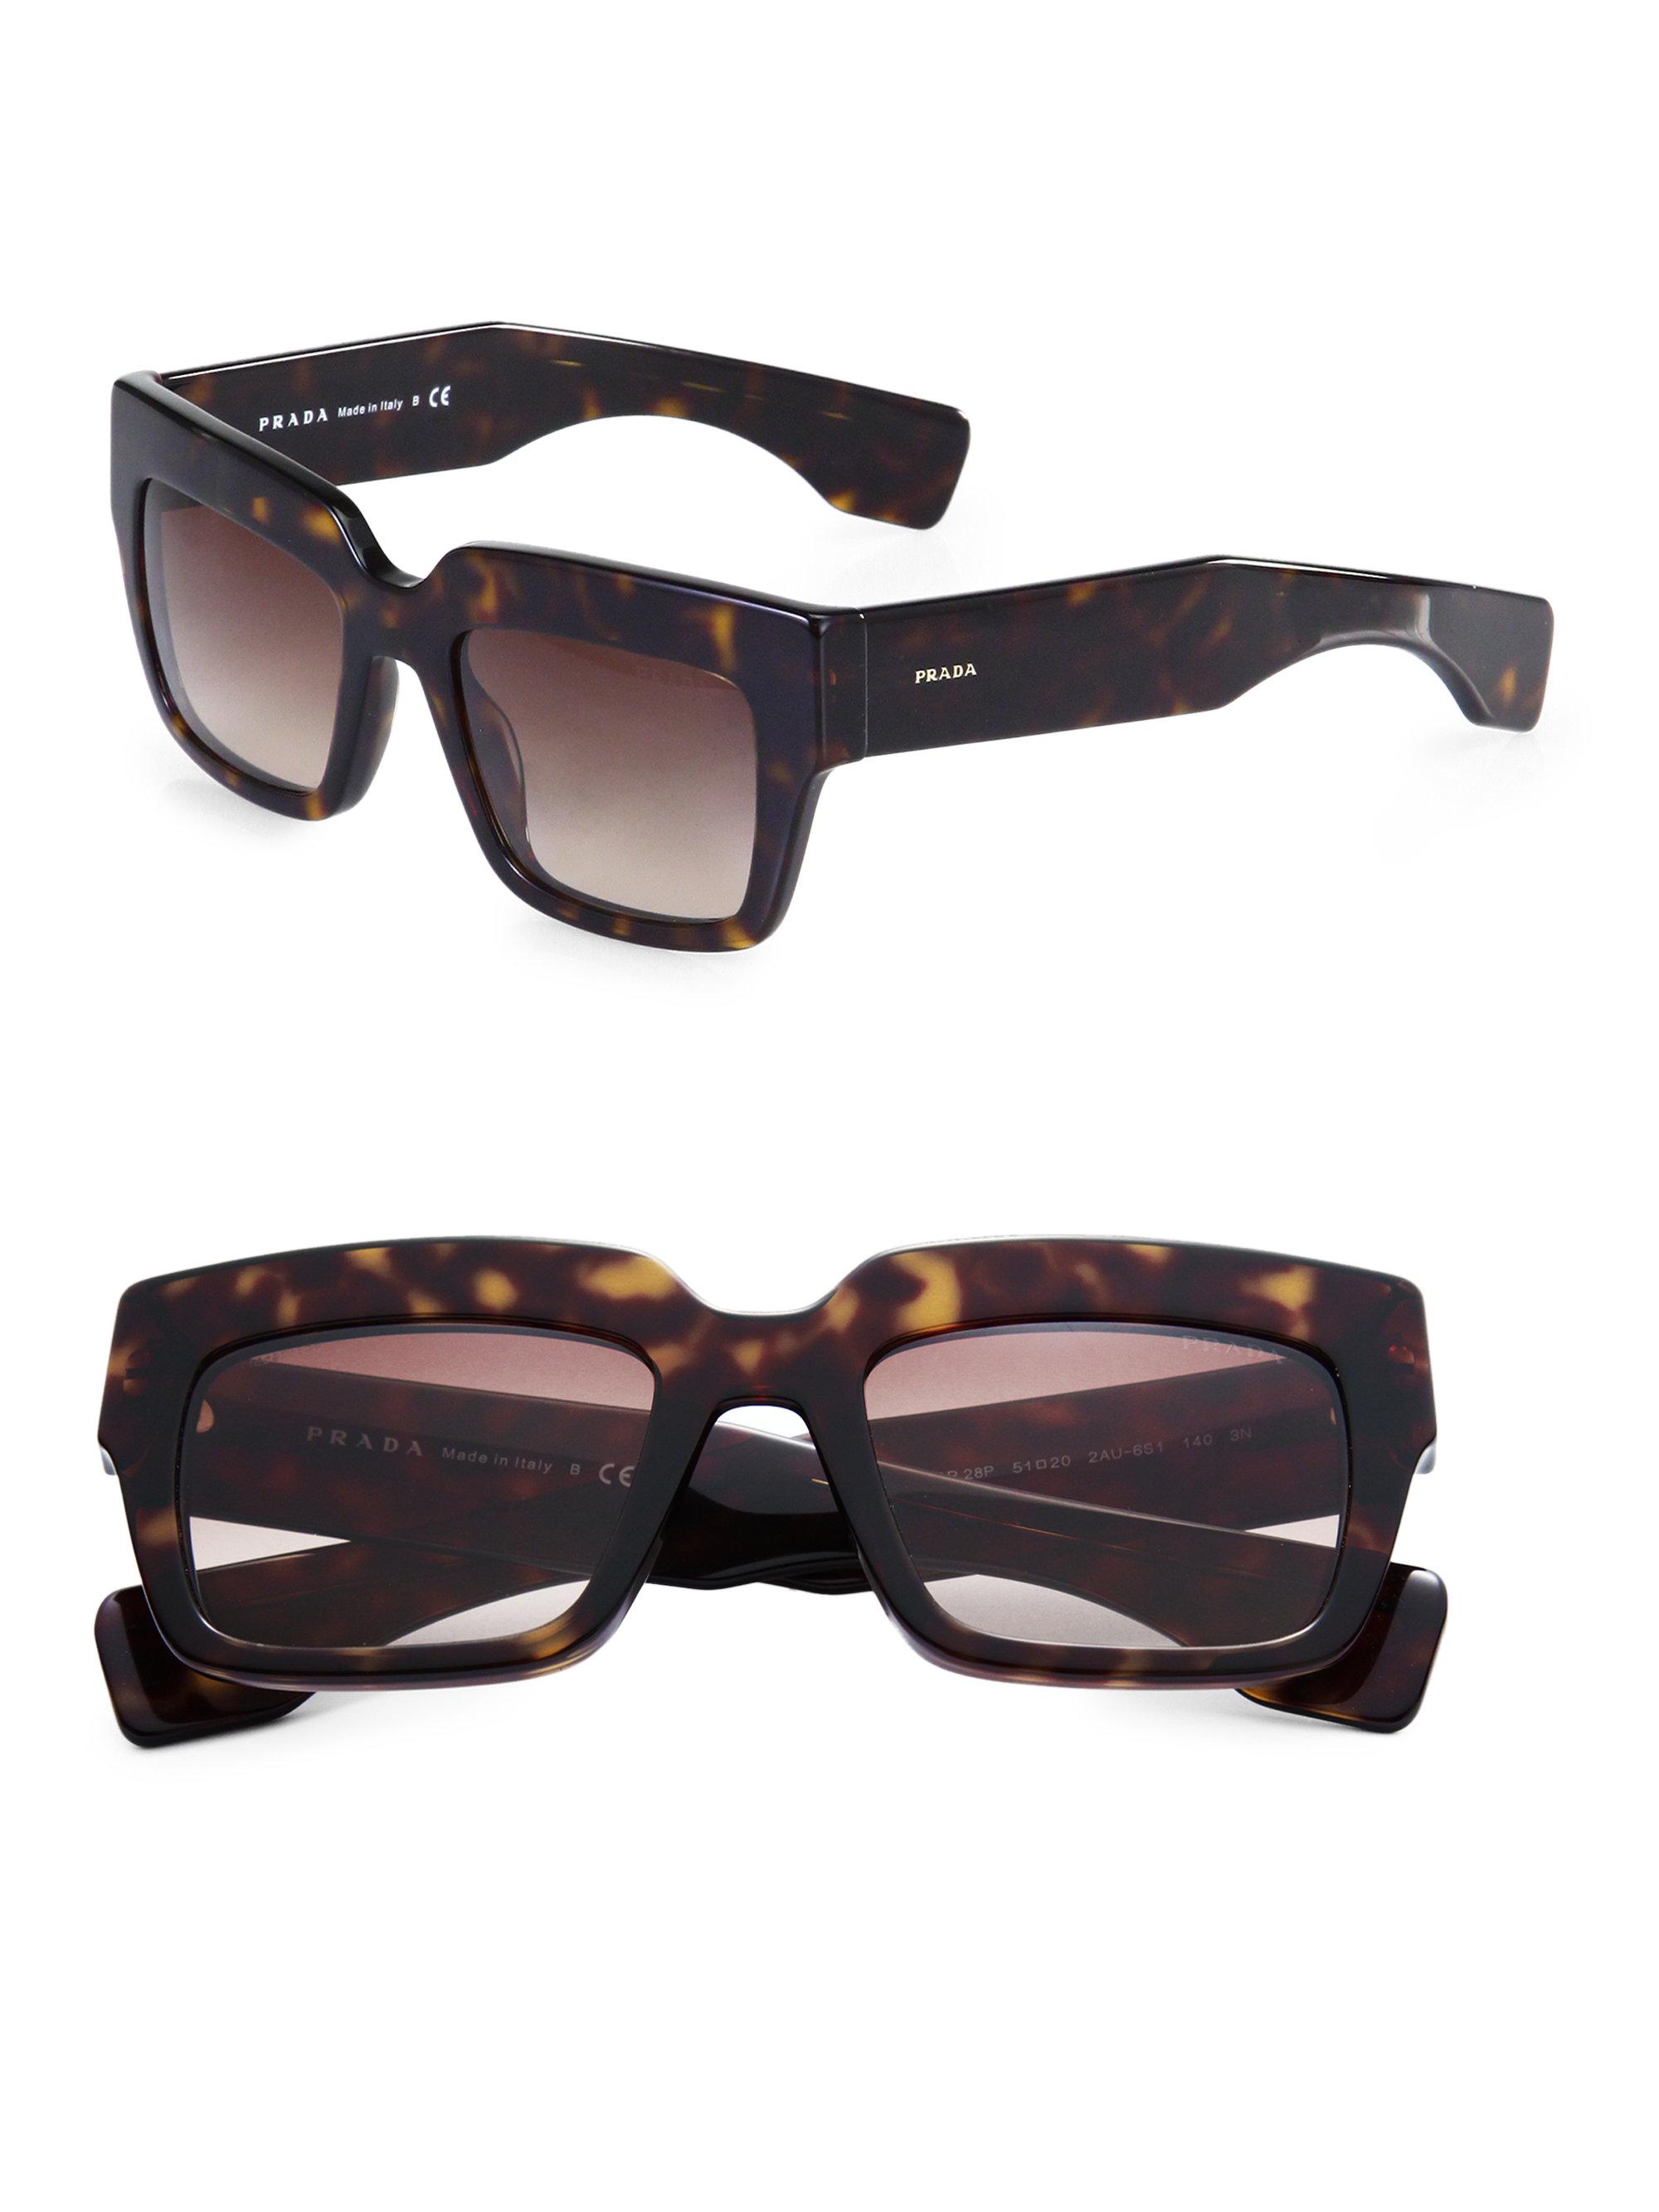 1f5d214160 Lyst - Prada Poeme Tortoise-Print Square Sunglasses in Brown